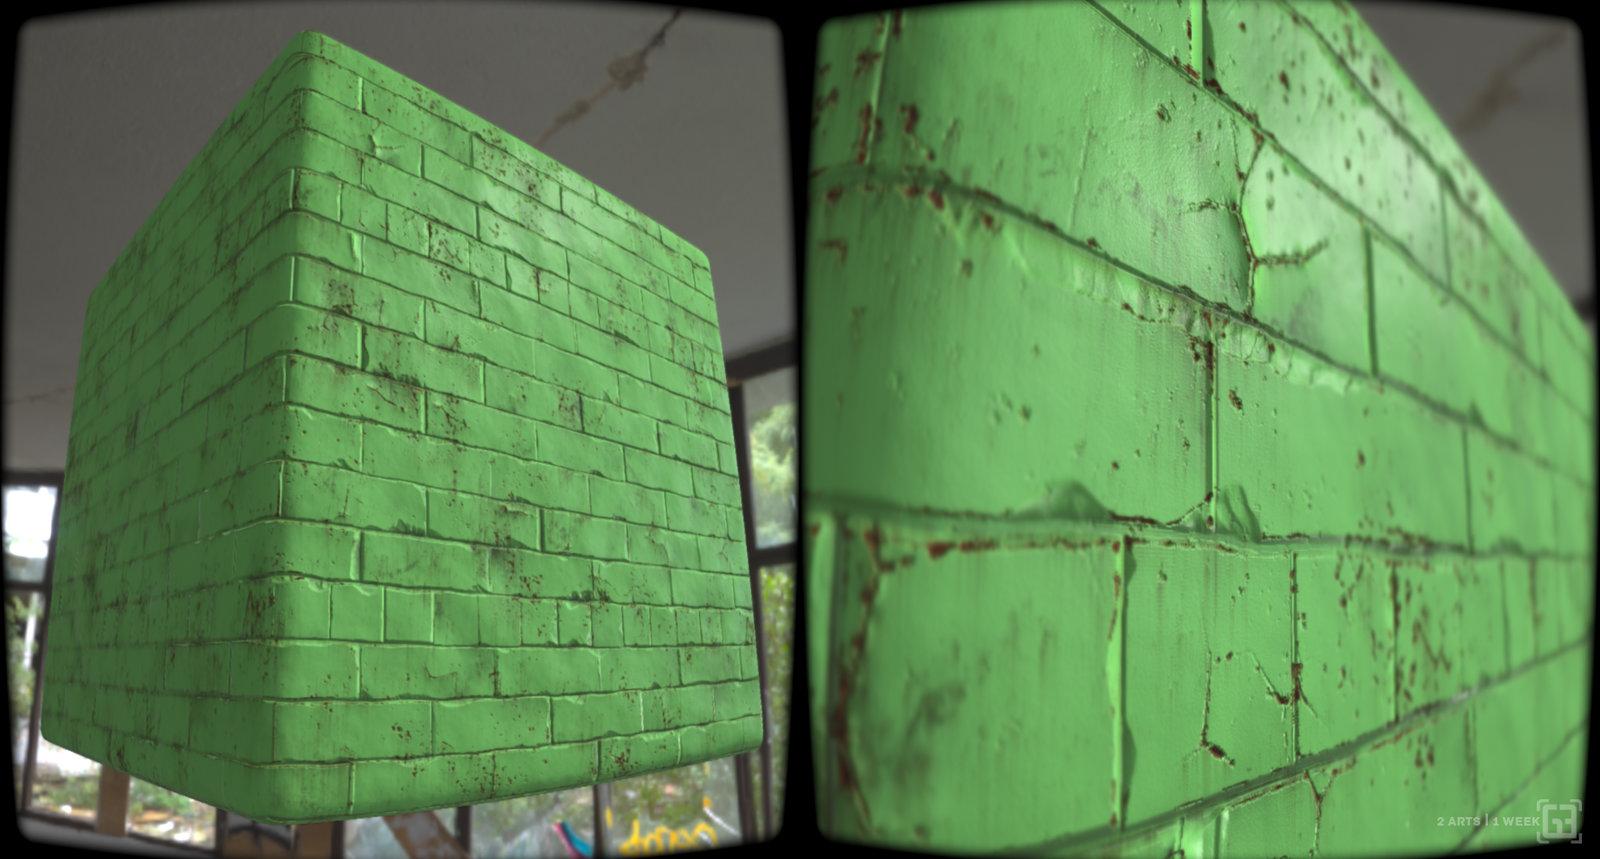 Old damaged painted brick wall